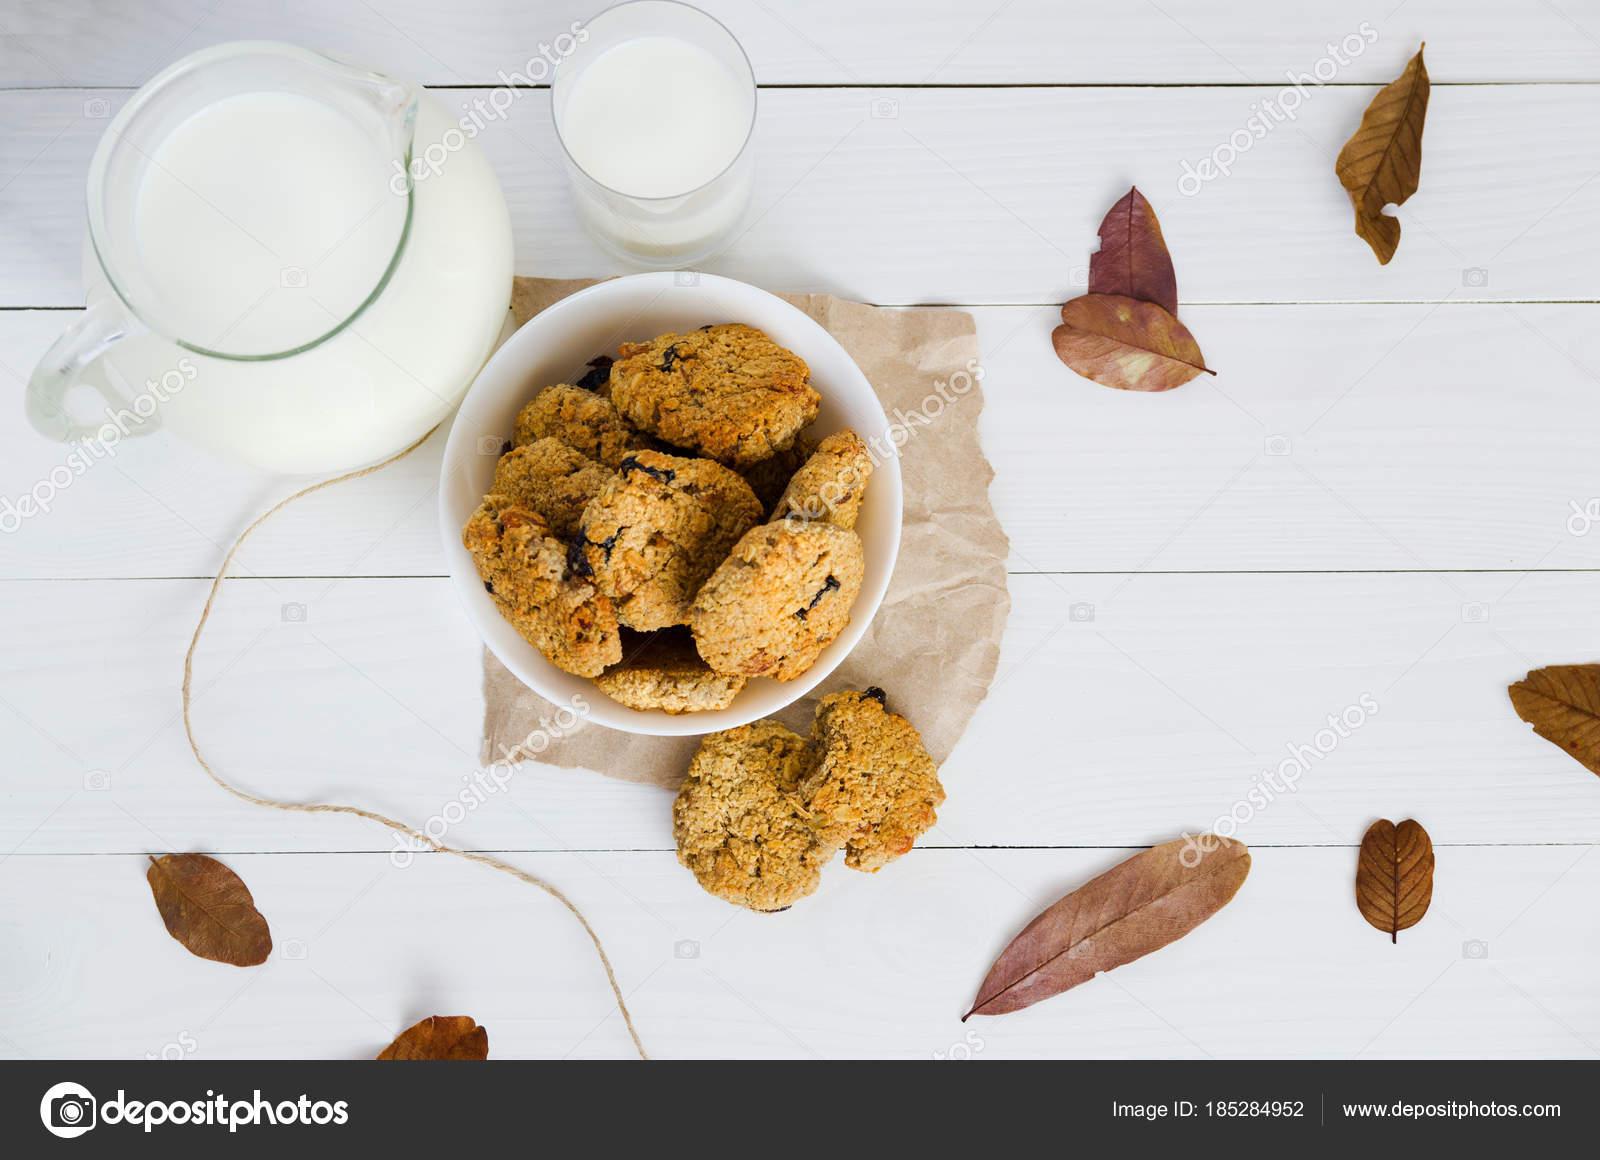 dieta priva di latte o zucchero